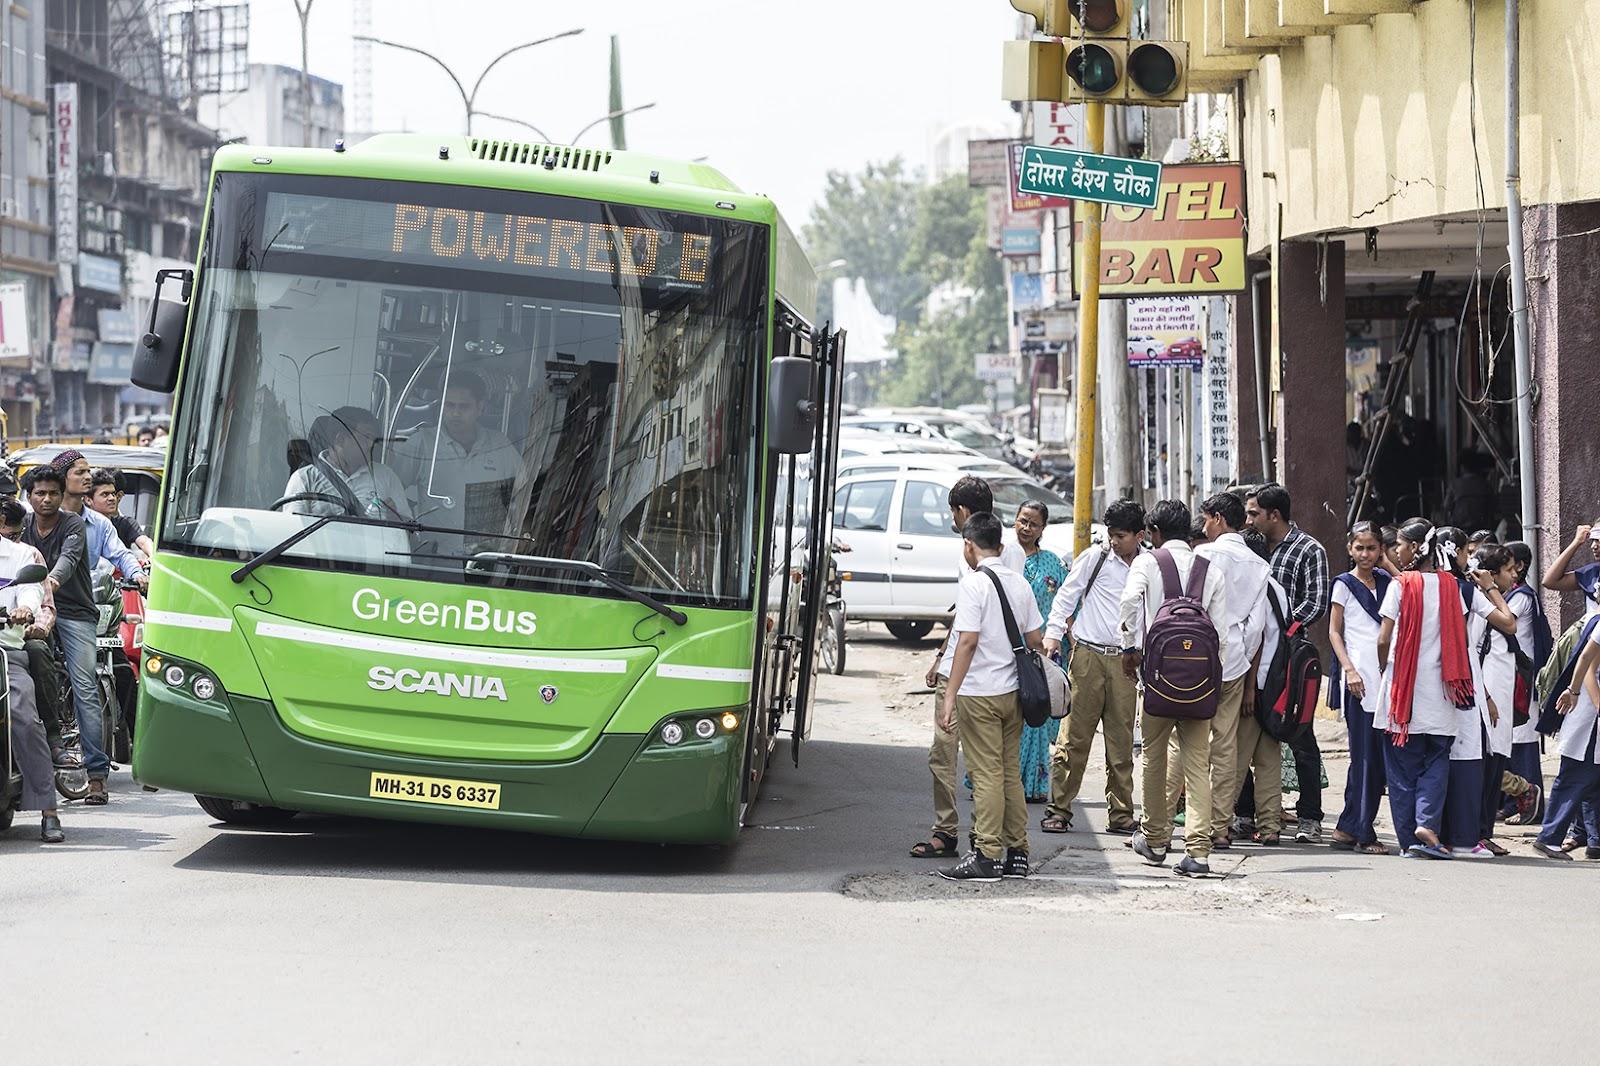 Nagpur, Green Bus, Bus, Green Nagpur, Green Buses, Scania, Starbus, Nagpur Municipal Corporation, NMC